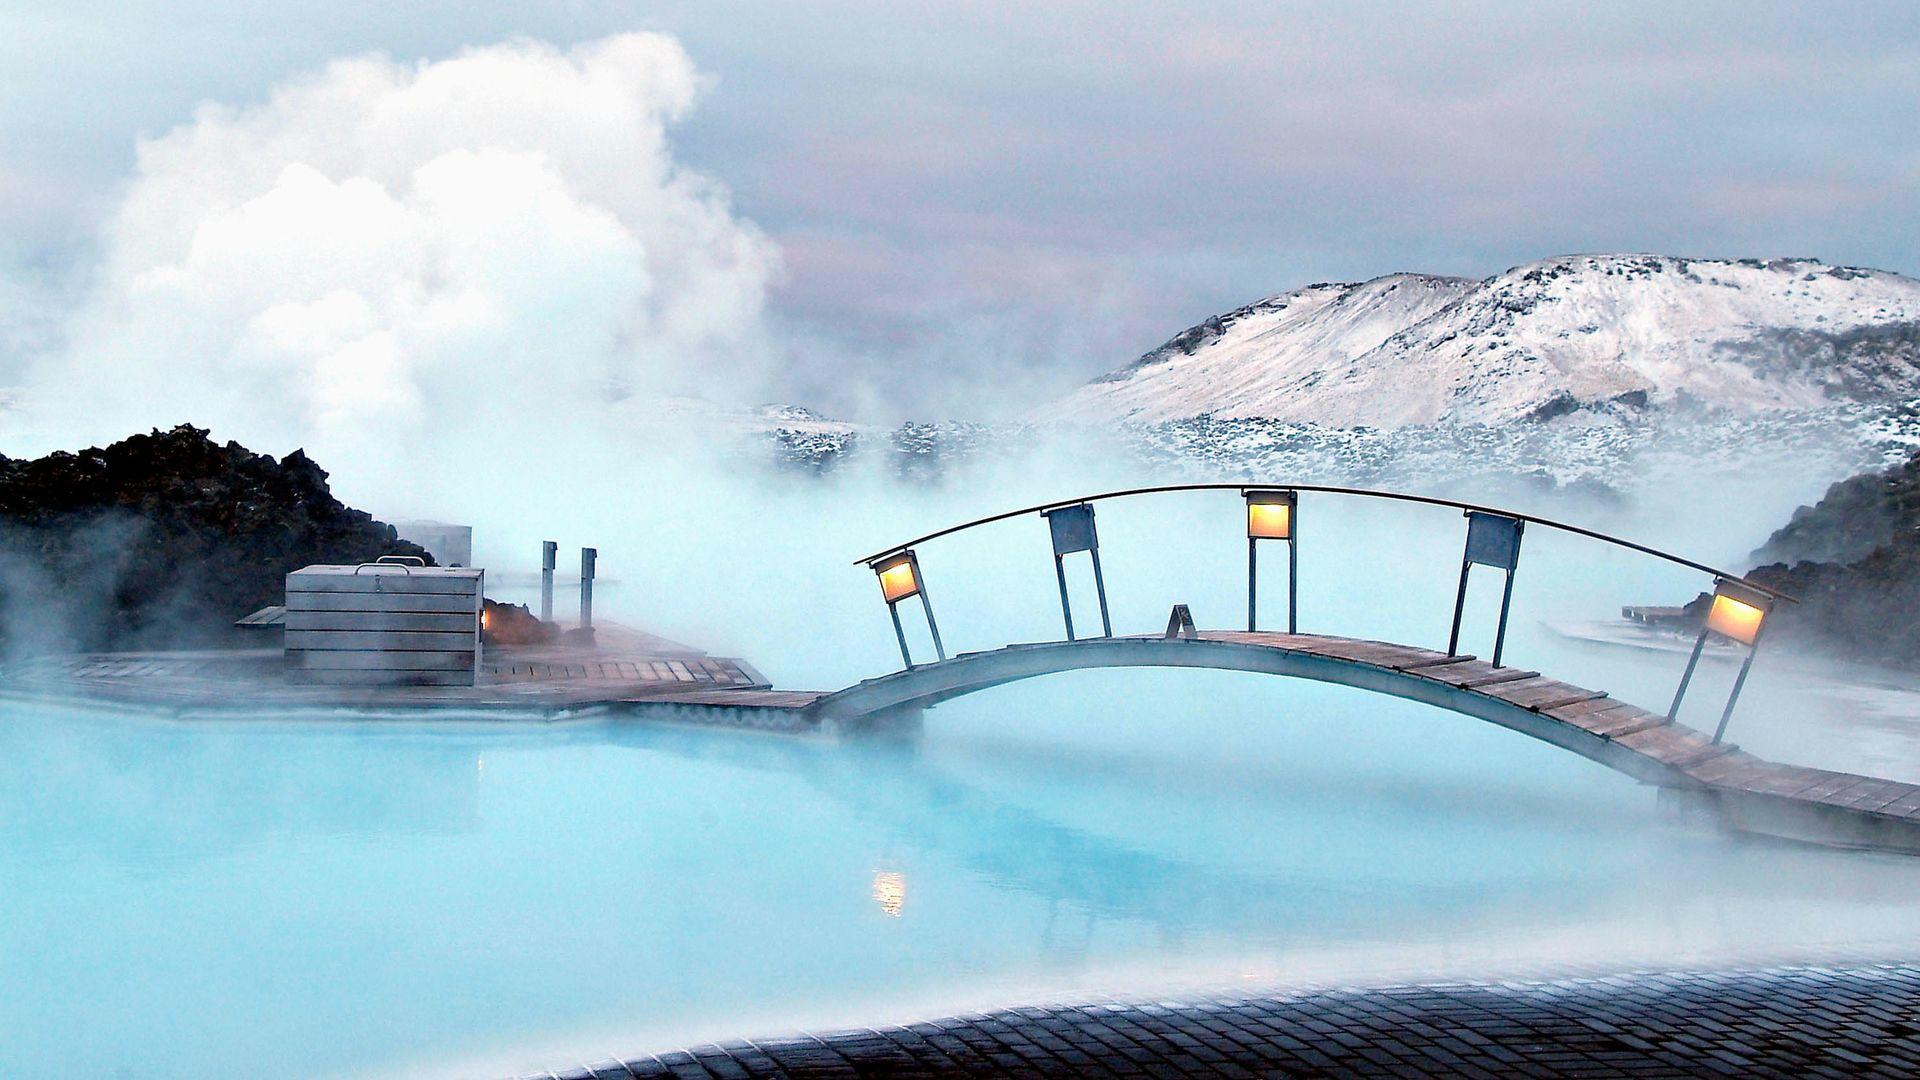 Best Time Iceland Northern Lights